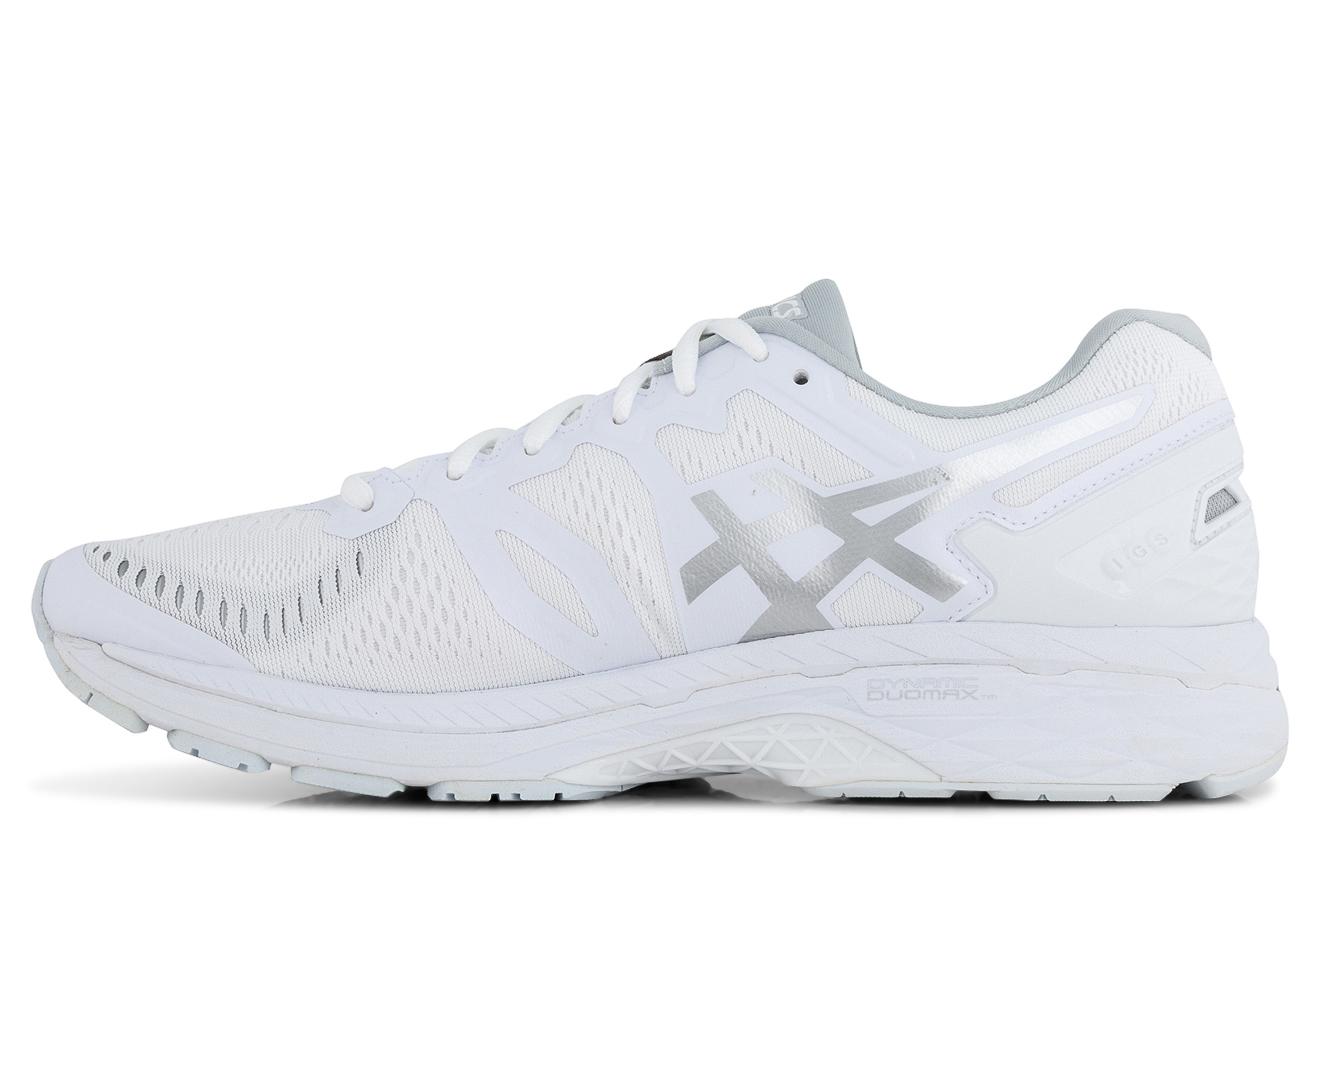 info for a1ef4 cdb59 ASICS Men's GEL-Kayano 23 Shoe - White/Snow/Silver